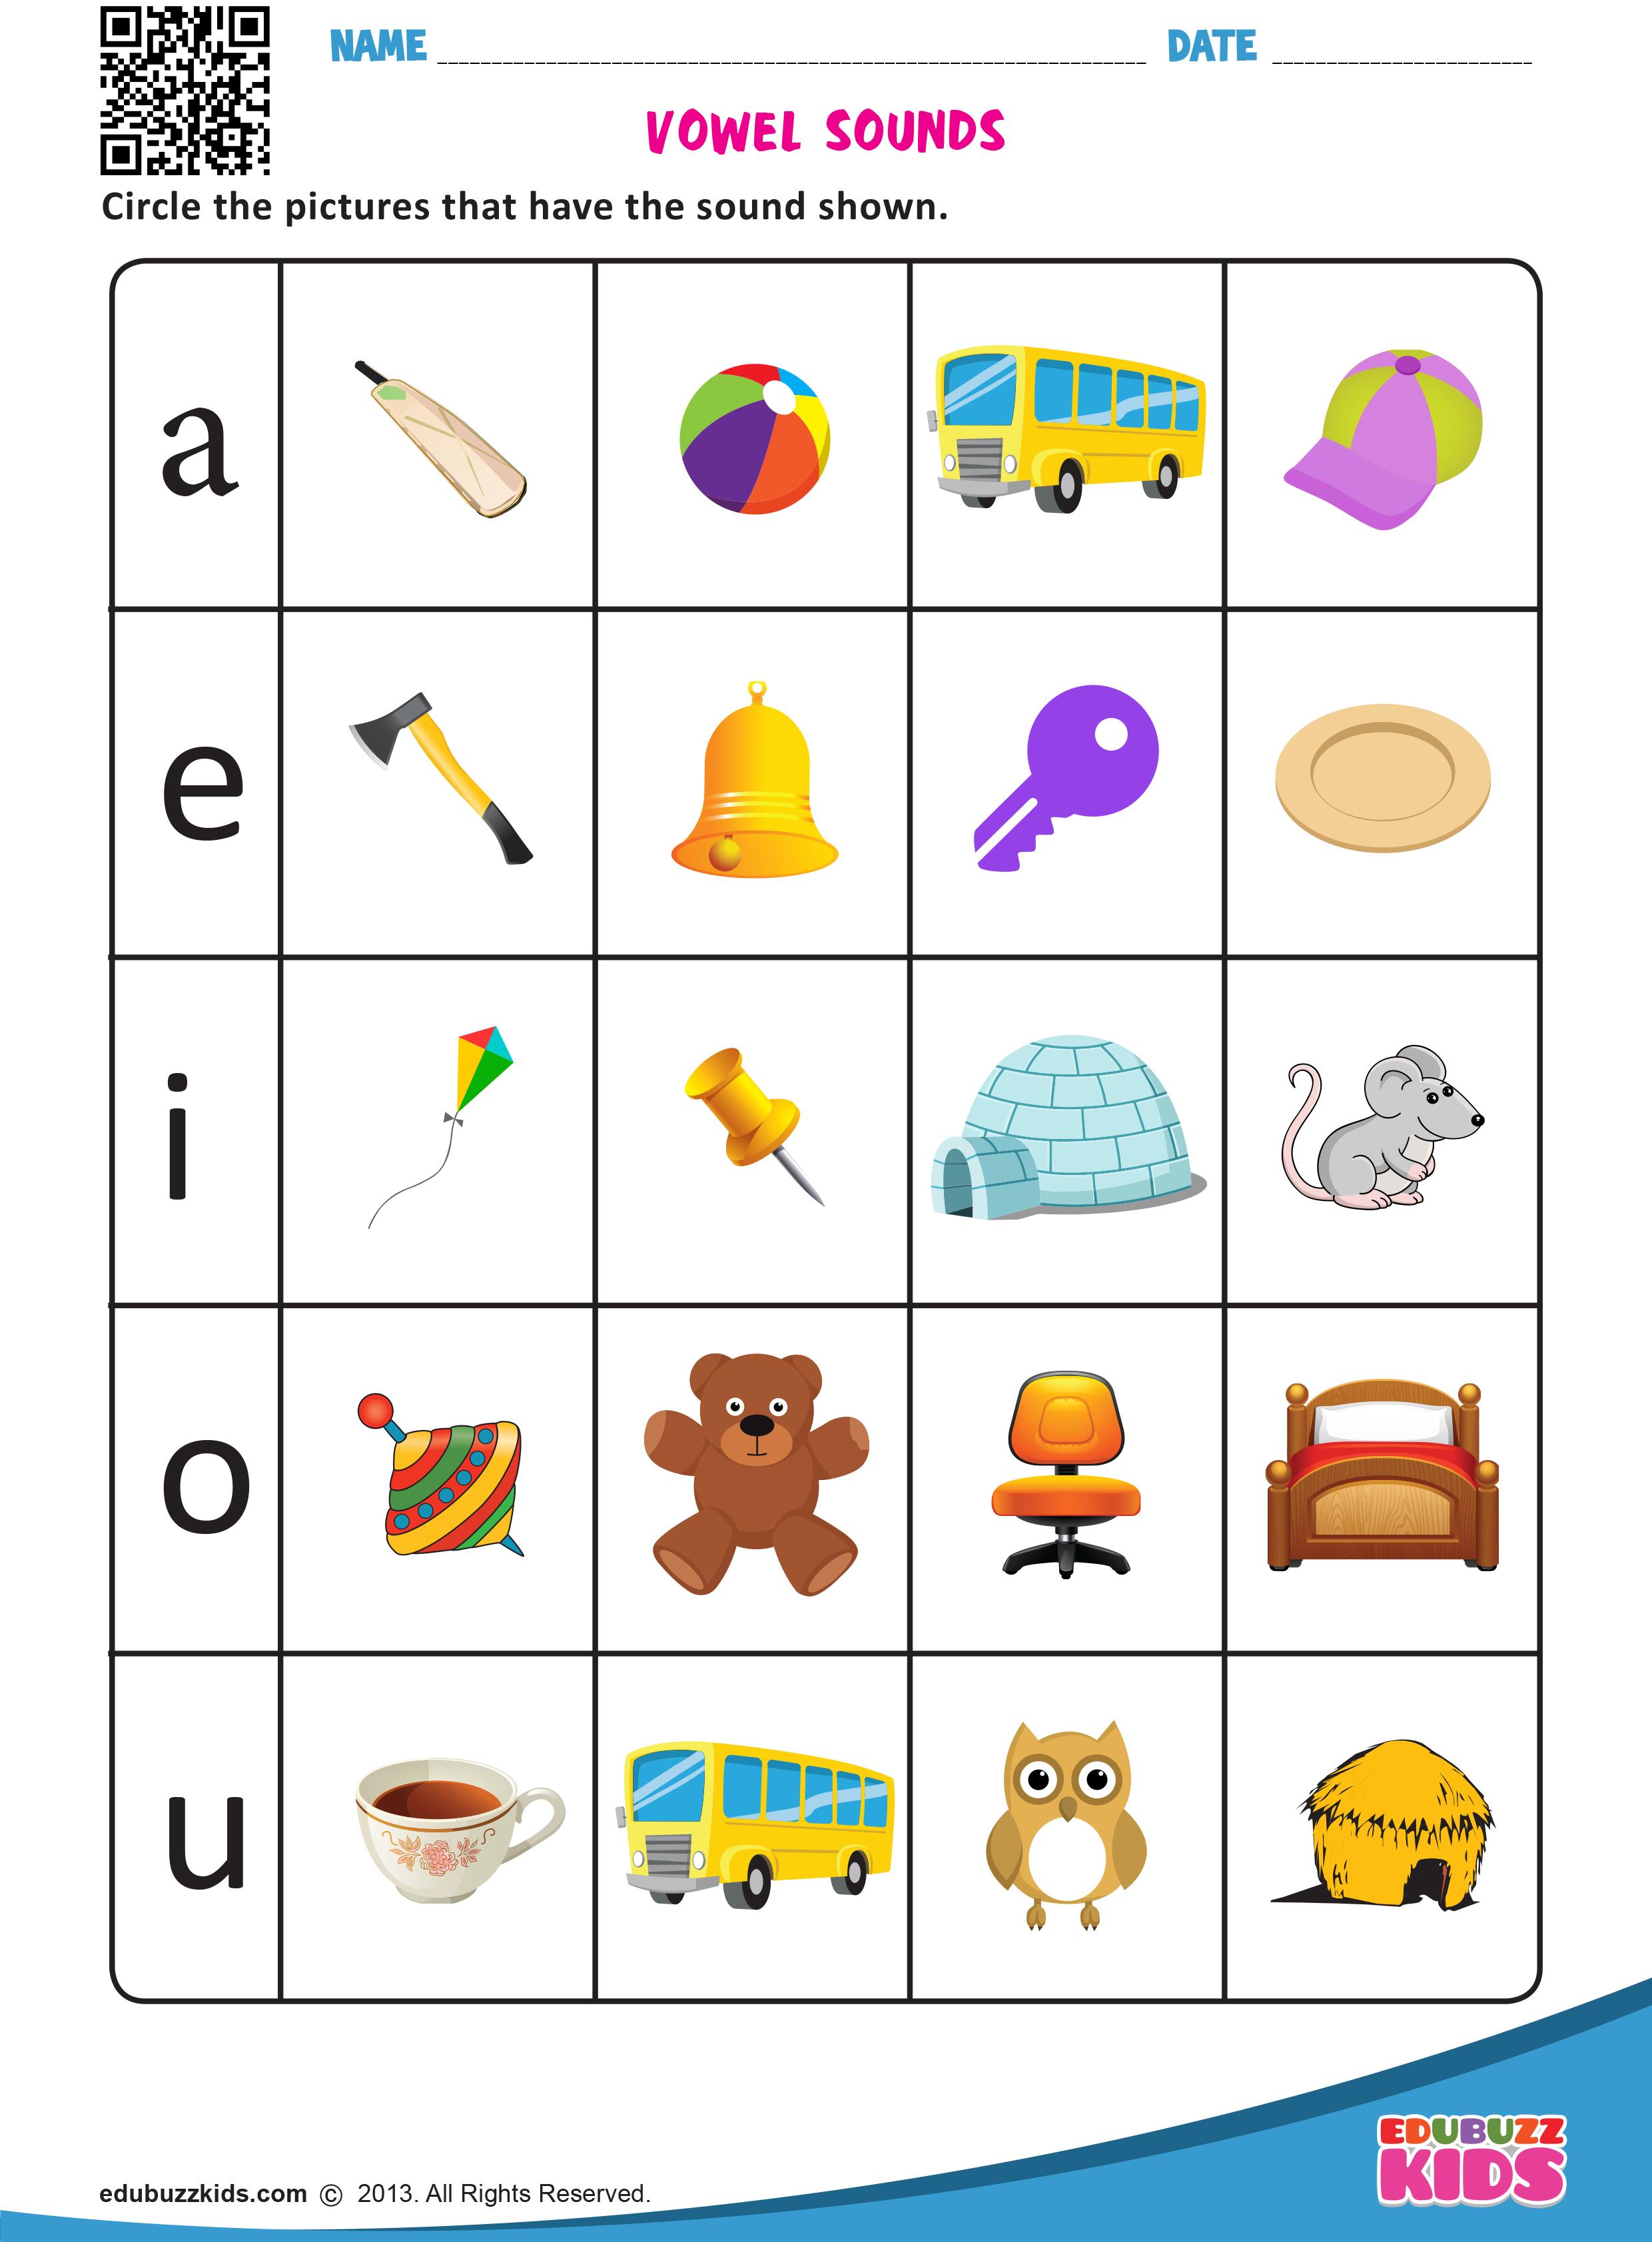 Vowel Sounds Worksheets For Preschool And Kindergarten